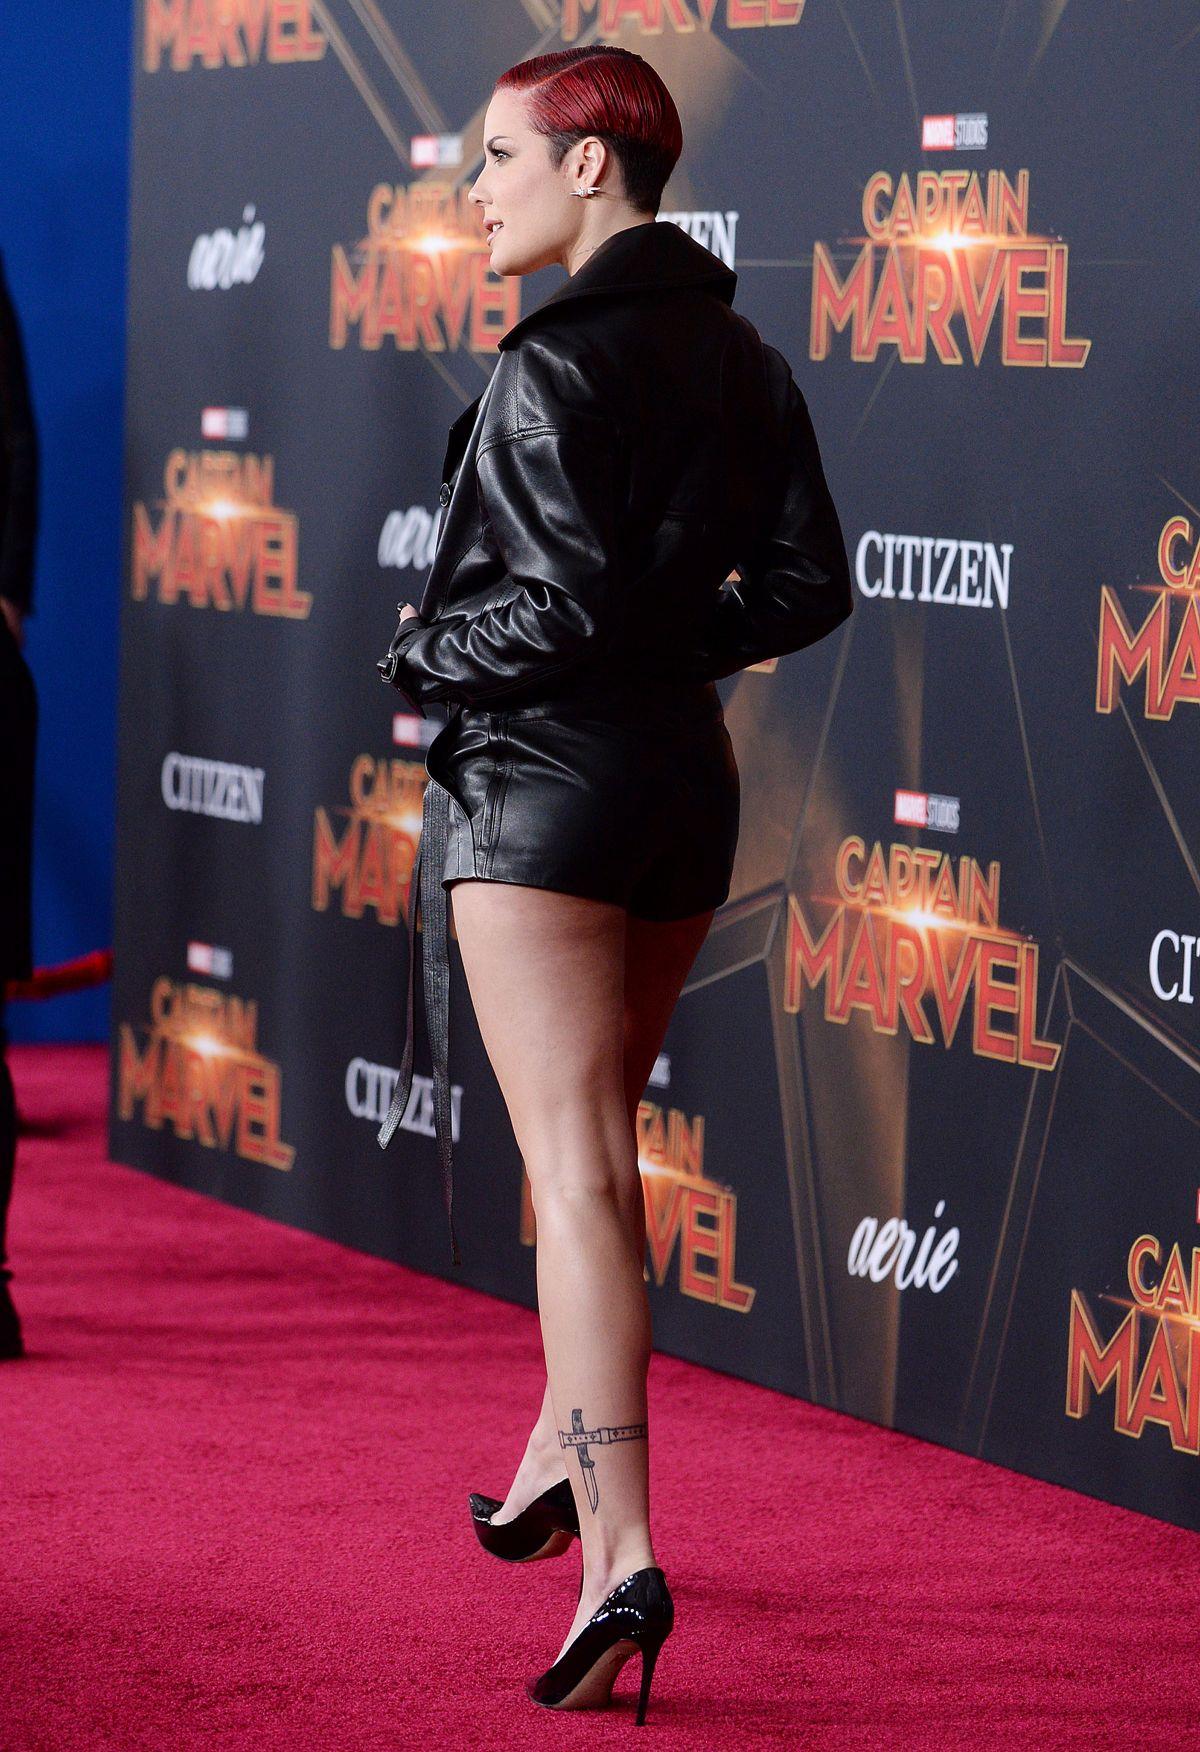 captain marvel 2019 near me zip